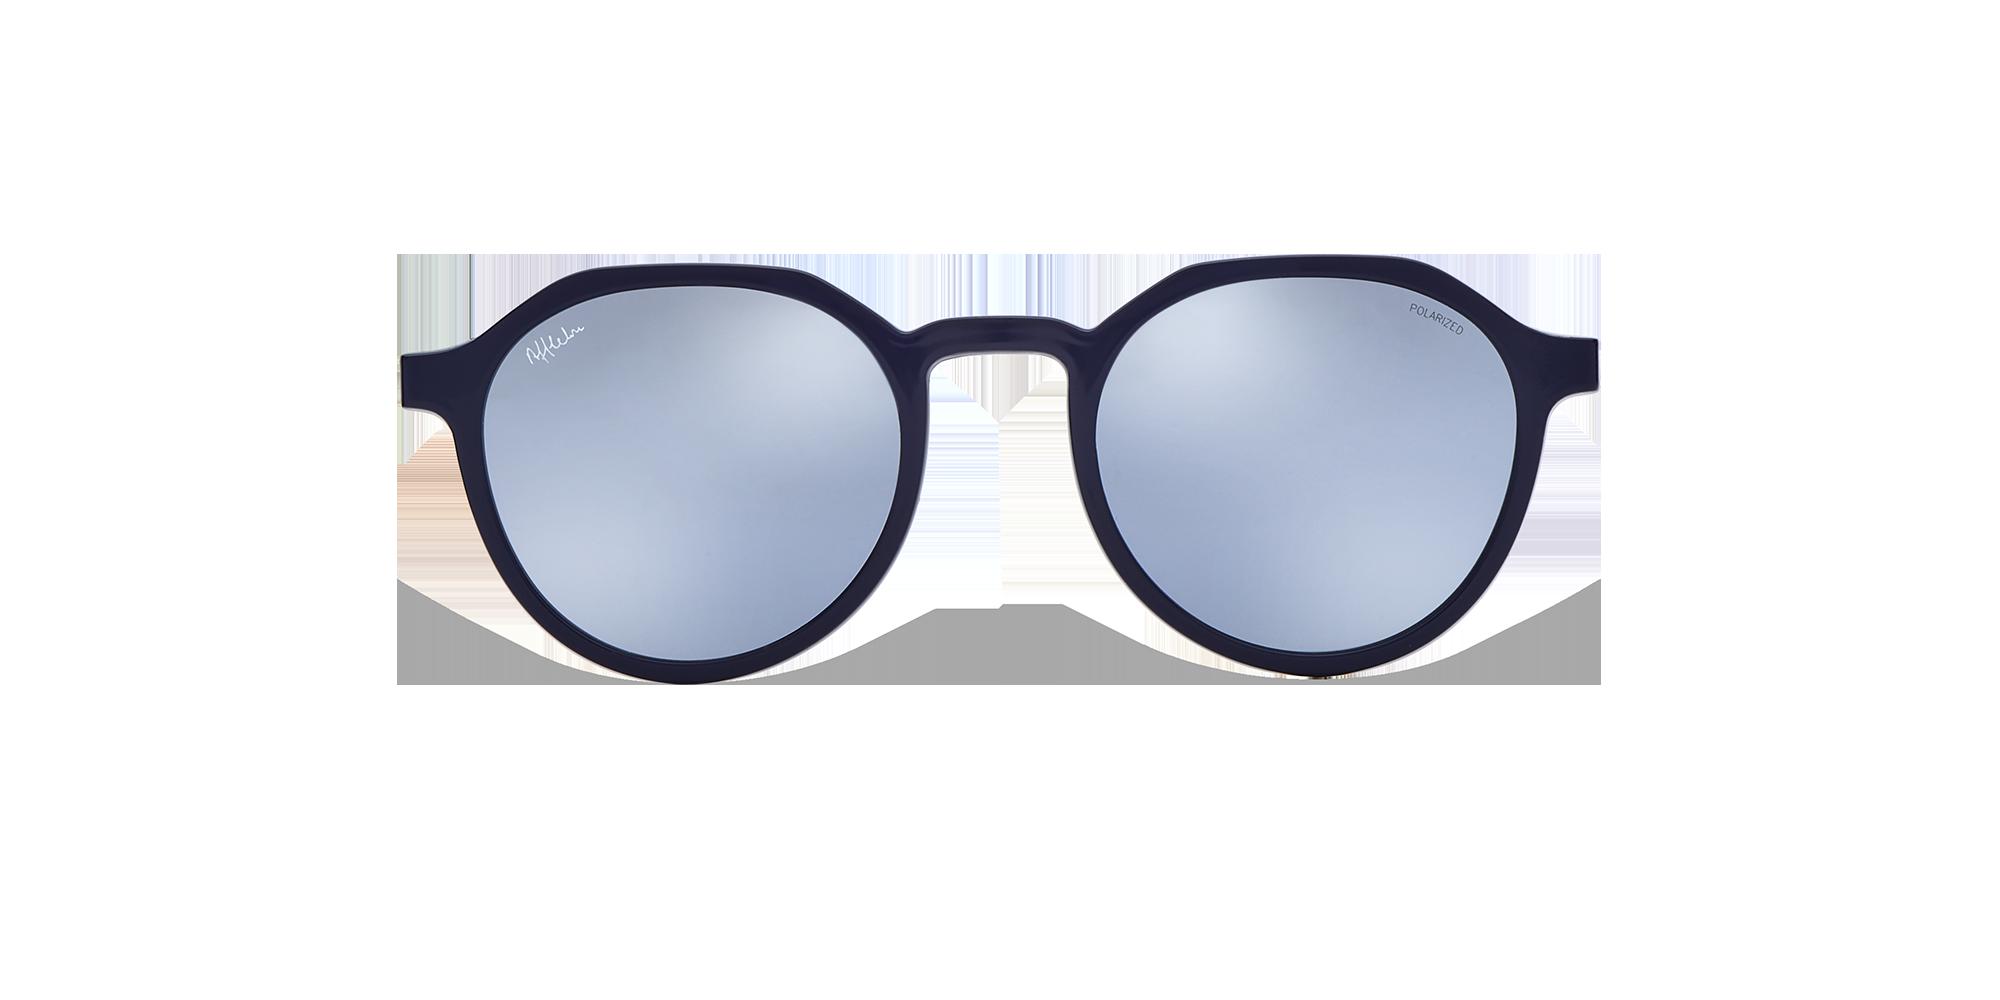 afflelou/france/products/smart_clip/clips_glasses/07630036428955_face.png